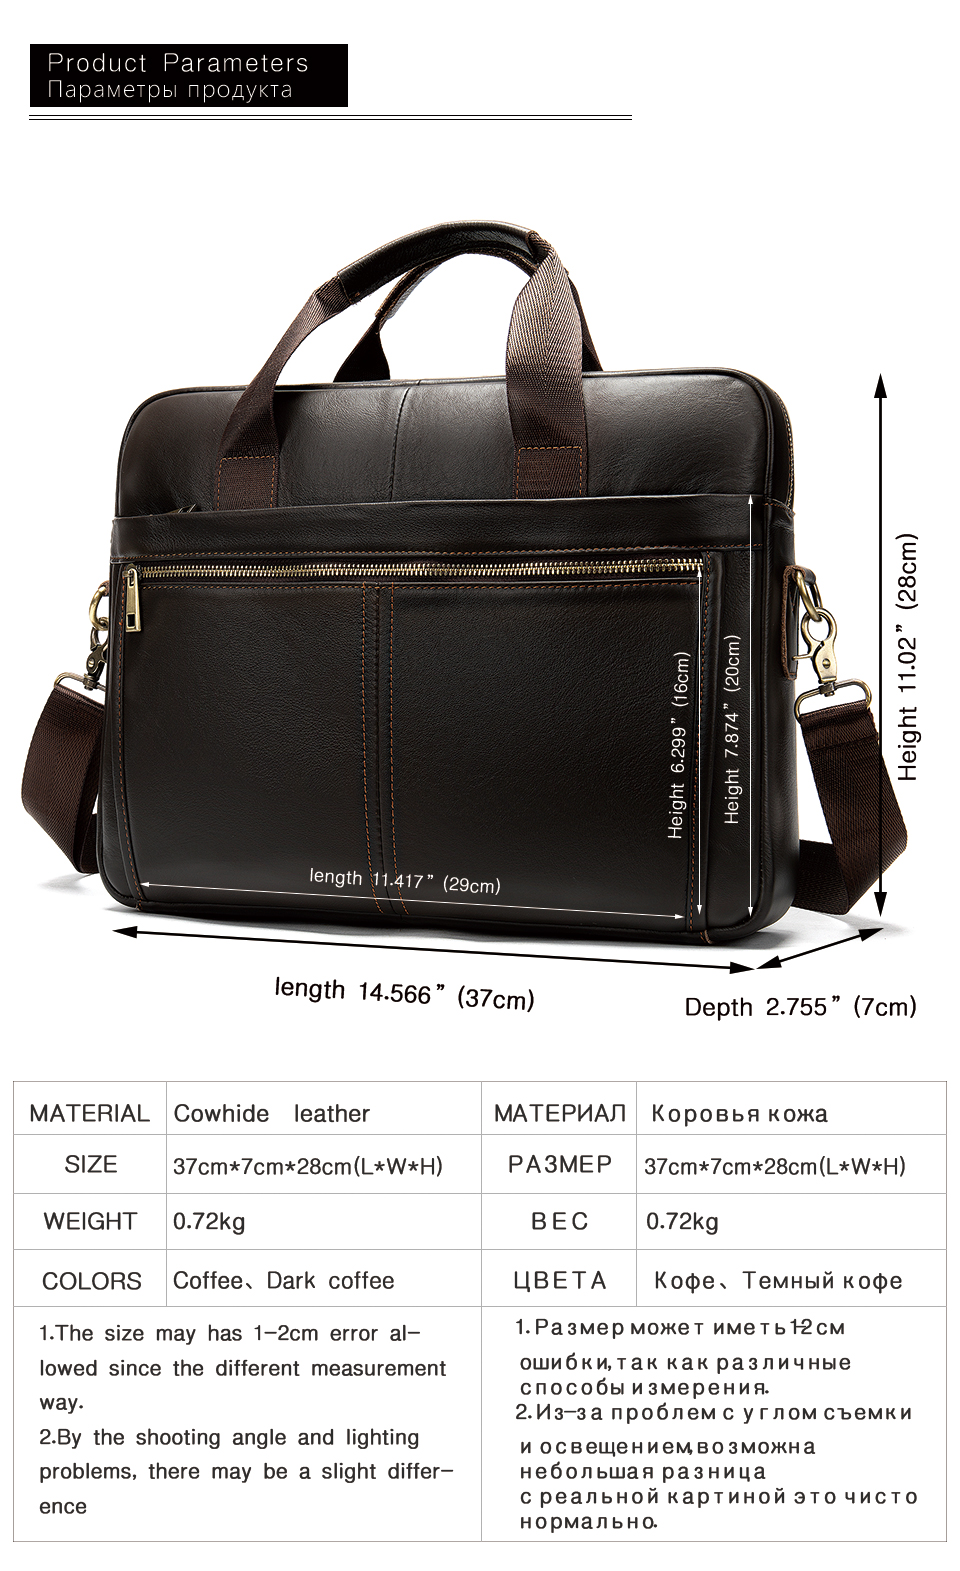 HTB1XJ1rUCzqK1RjSZPcq6zTepXa0 WESTAL briefcase messenger bag men's genuine leather 14'' laptop bag men's briefcases office business tote for document 8572